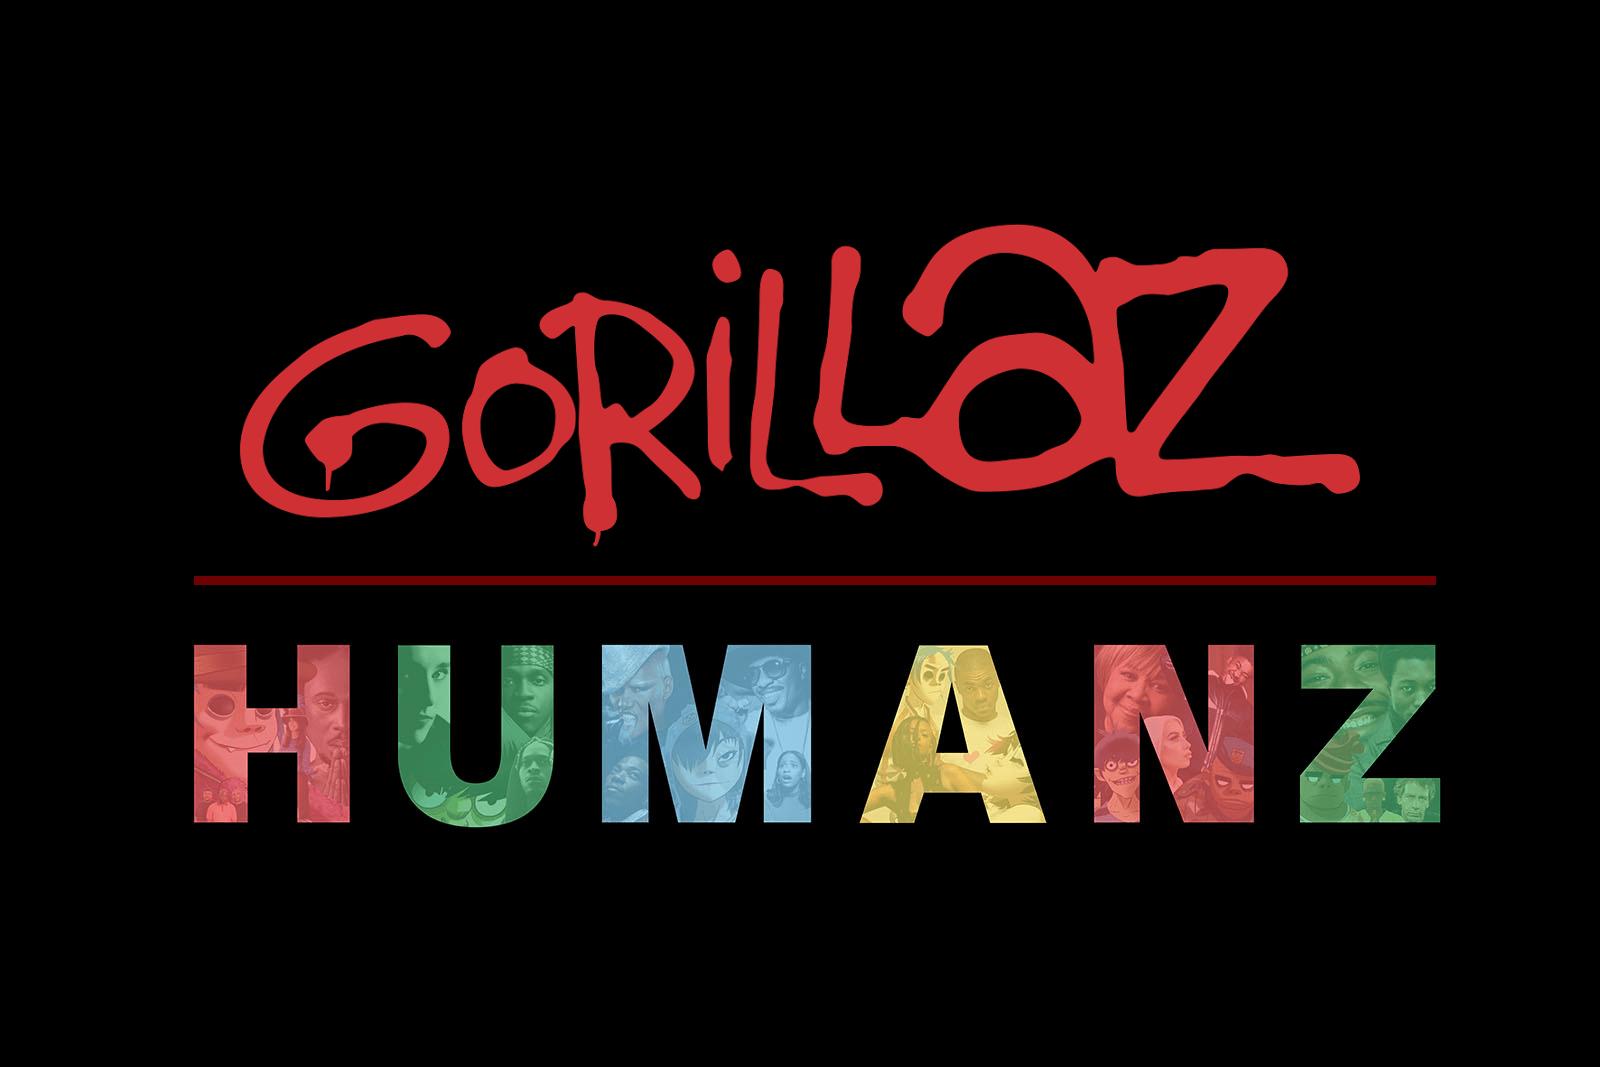 How To Get Live Wallpapers On Iphone 5 Gorillaz Humanz Wallpaper 1920x1080 Gorillaz